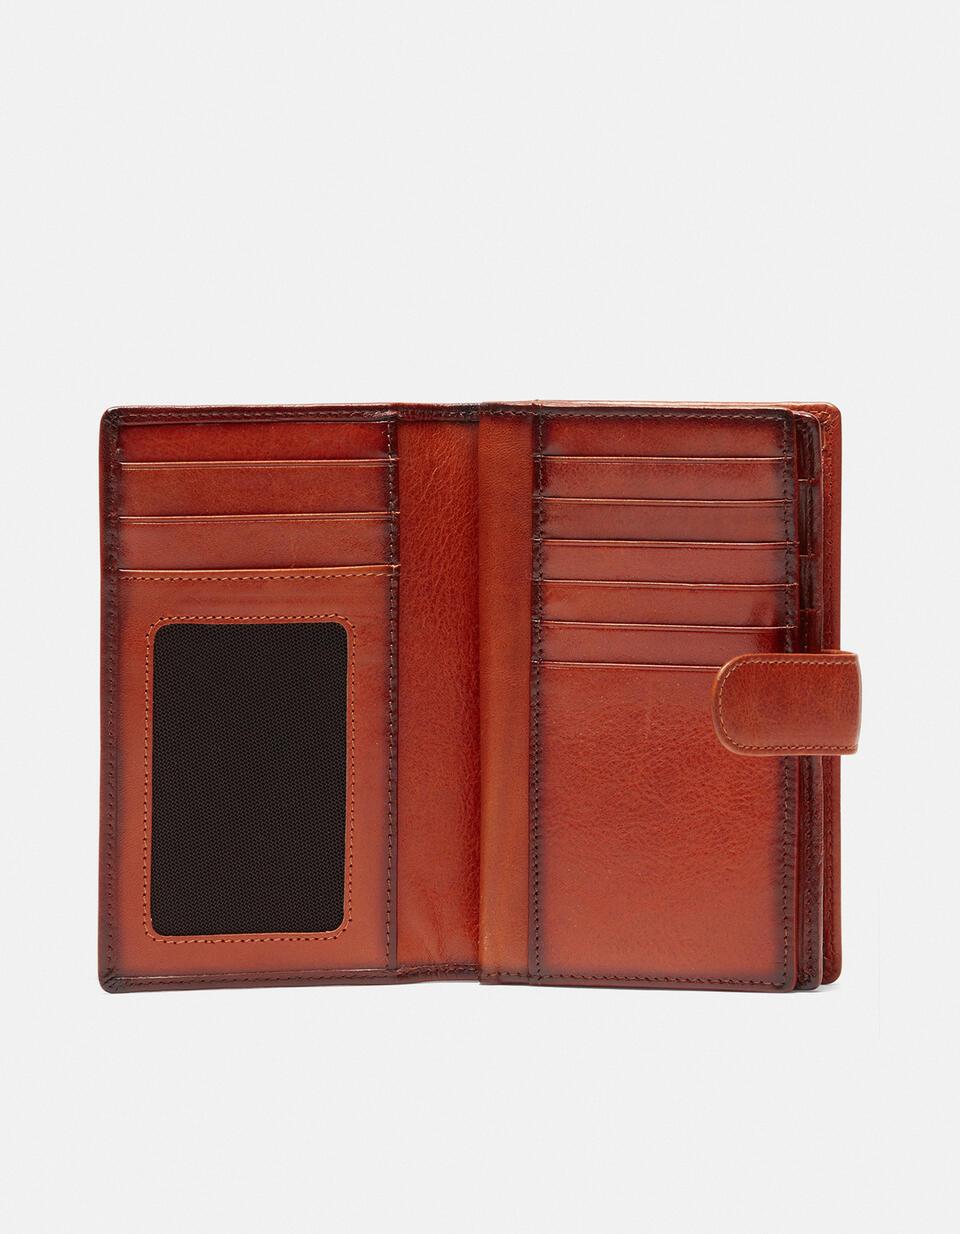 Warm and Color wallet with coin purse ARANCIO Cuoieria Fiorentina